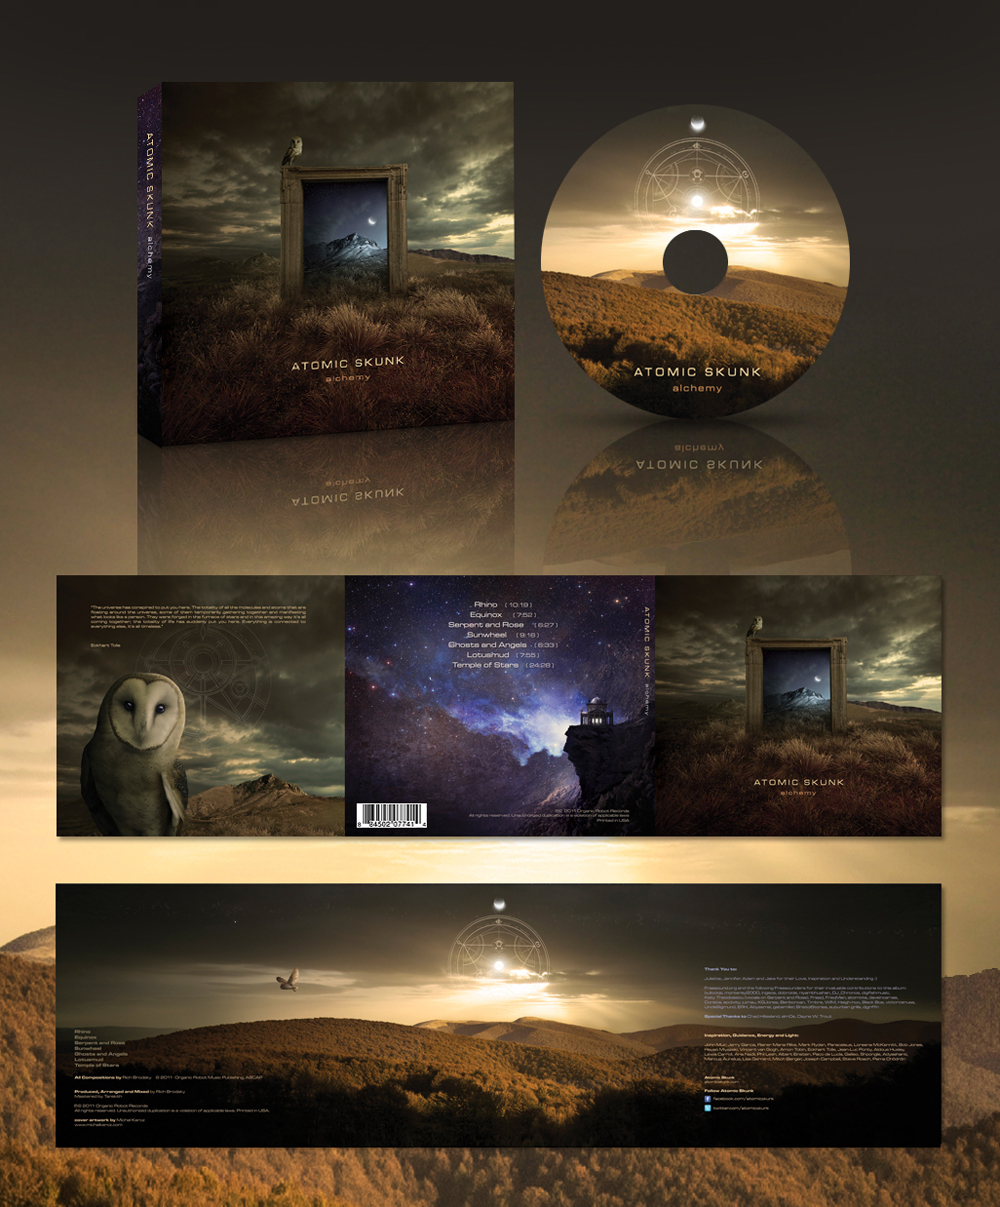 ATOMIC SKUNK Alchemy cover by Karezoid